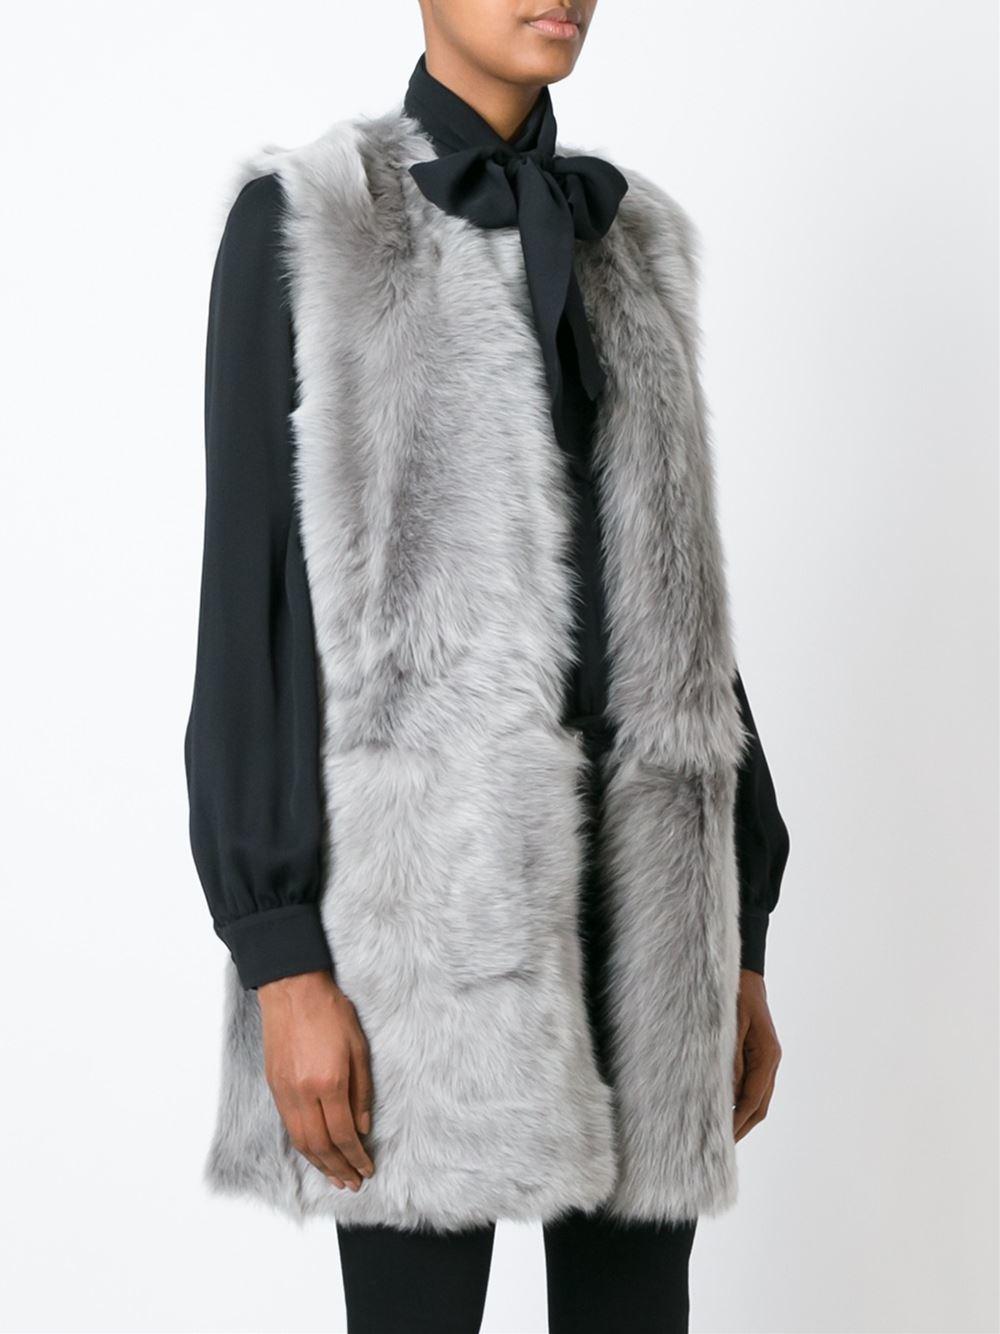 lyst ralph lauren black label shearling long gilet in gray. Black Bedroom Furniture Sets. Home Design Ideas